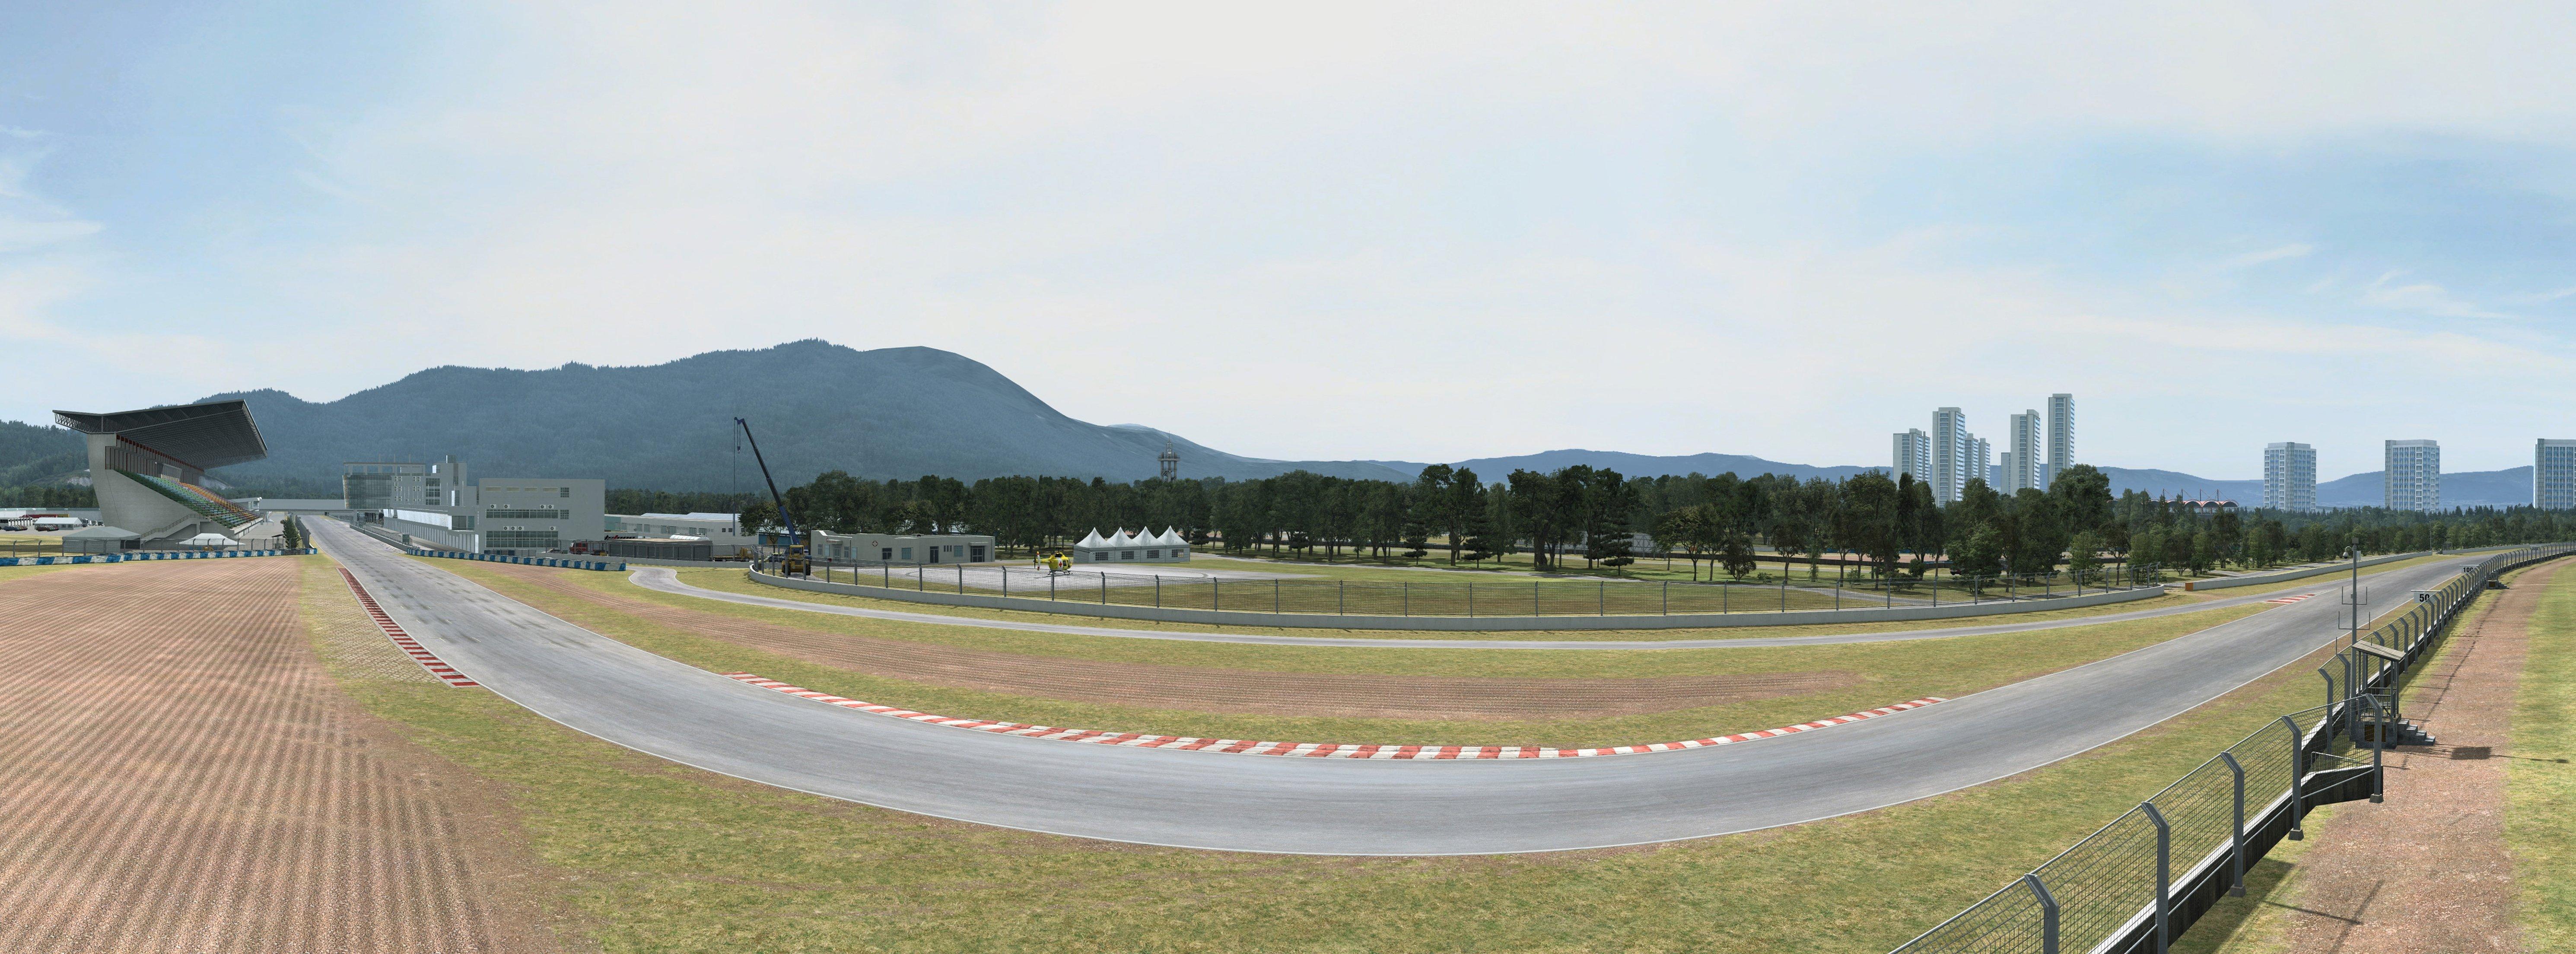 RaceRoom Zhuhai International Circuit 1